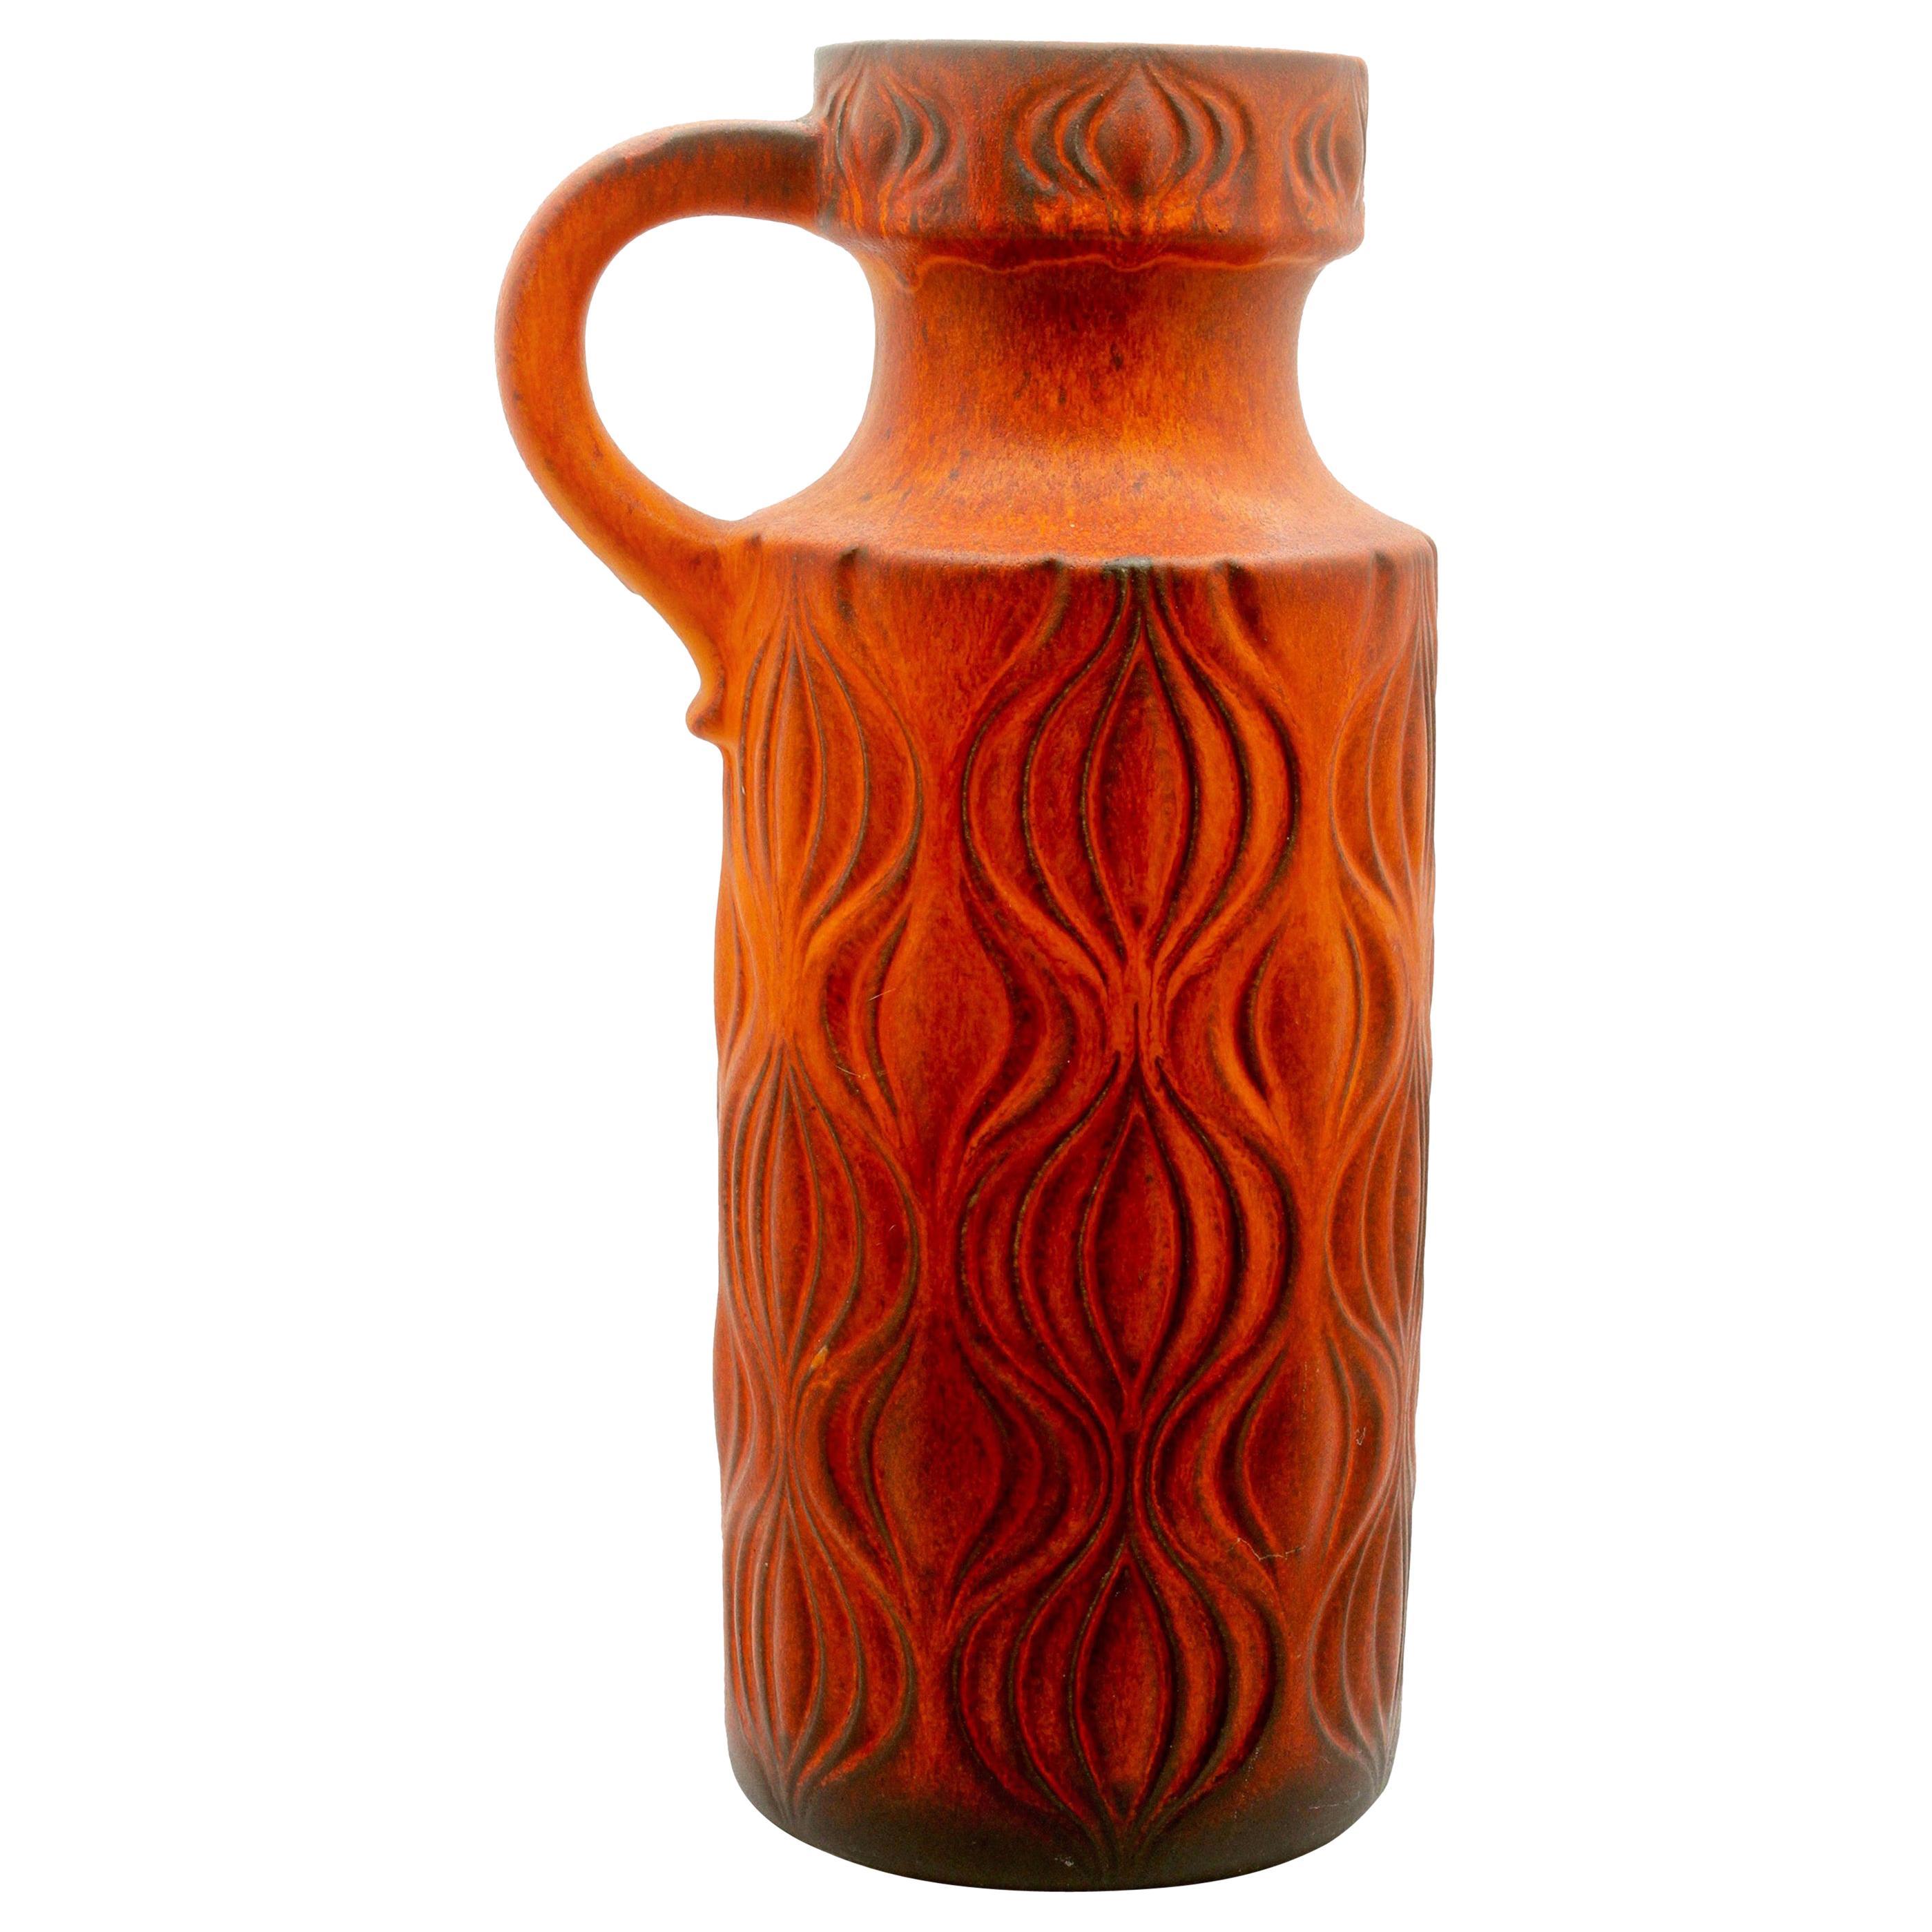 "Fat Lava 'Scheurich' Decor ""Amsterdam"" Large Jar, Vintage, W-Germany, 1964"